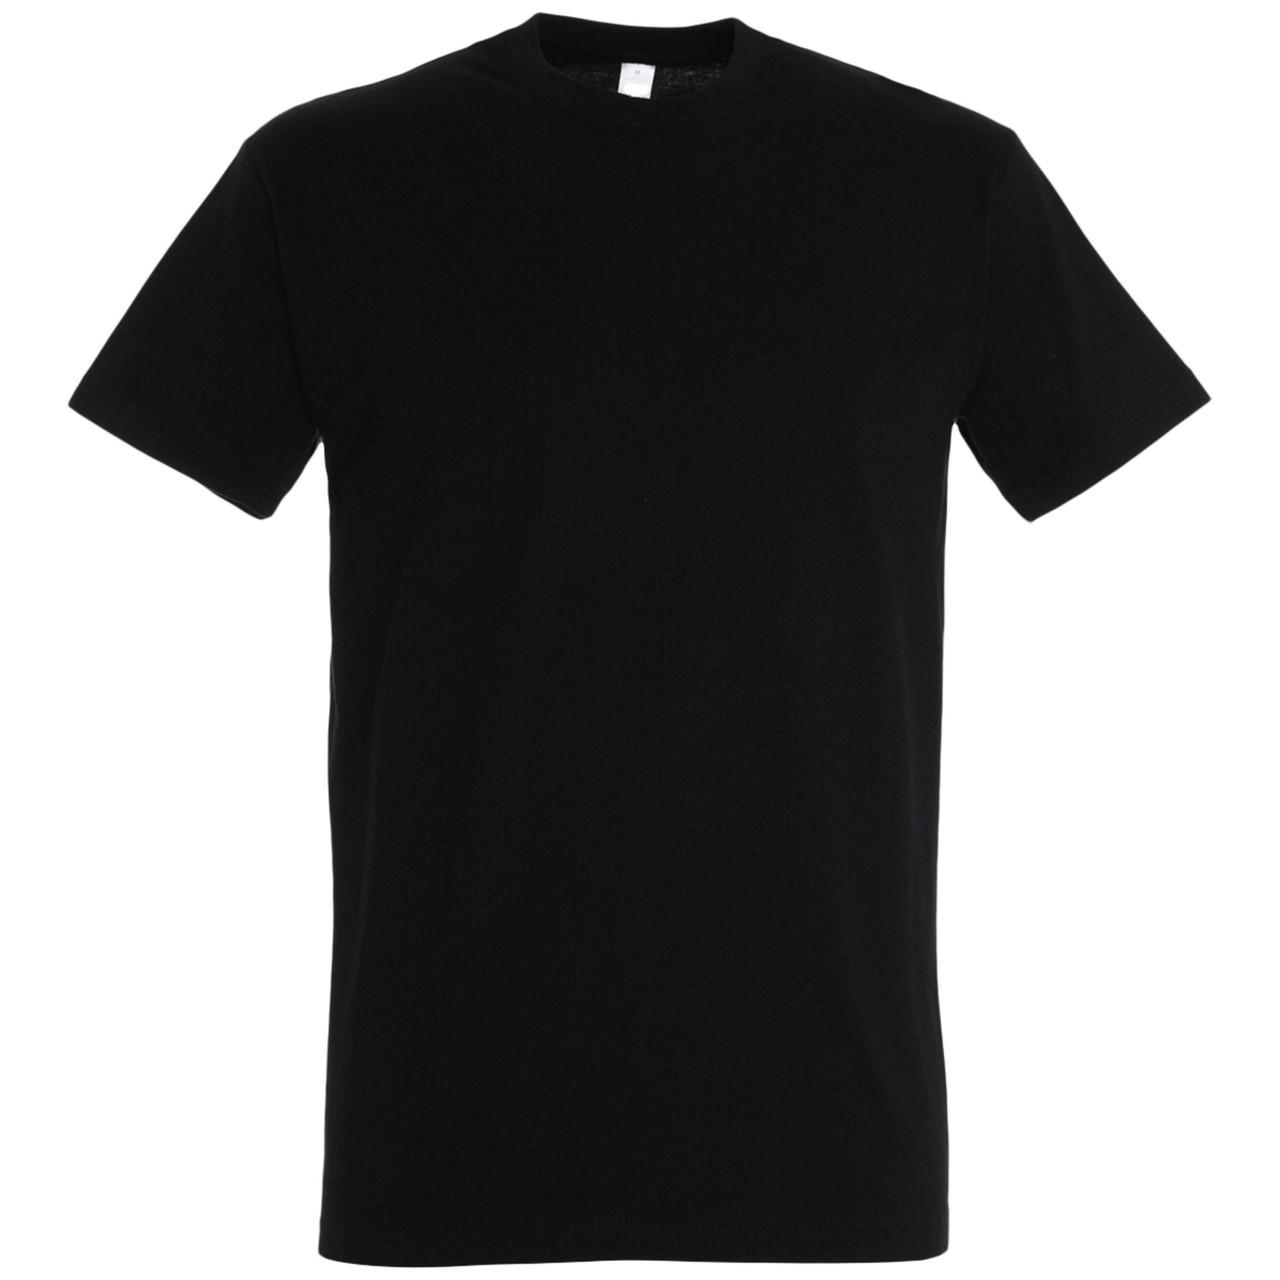 Oднотонная футболка | Черная | 160 гр. | XS